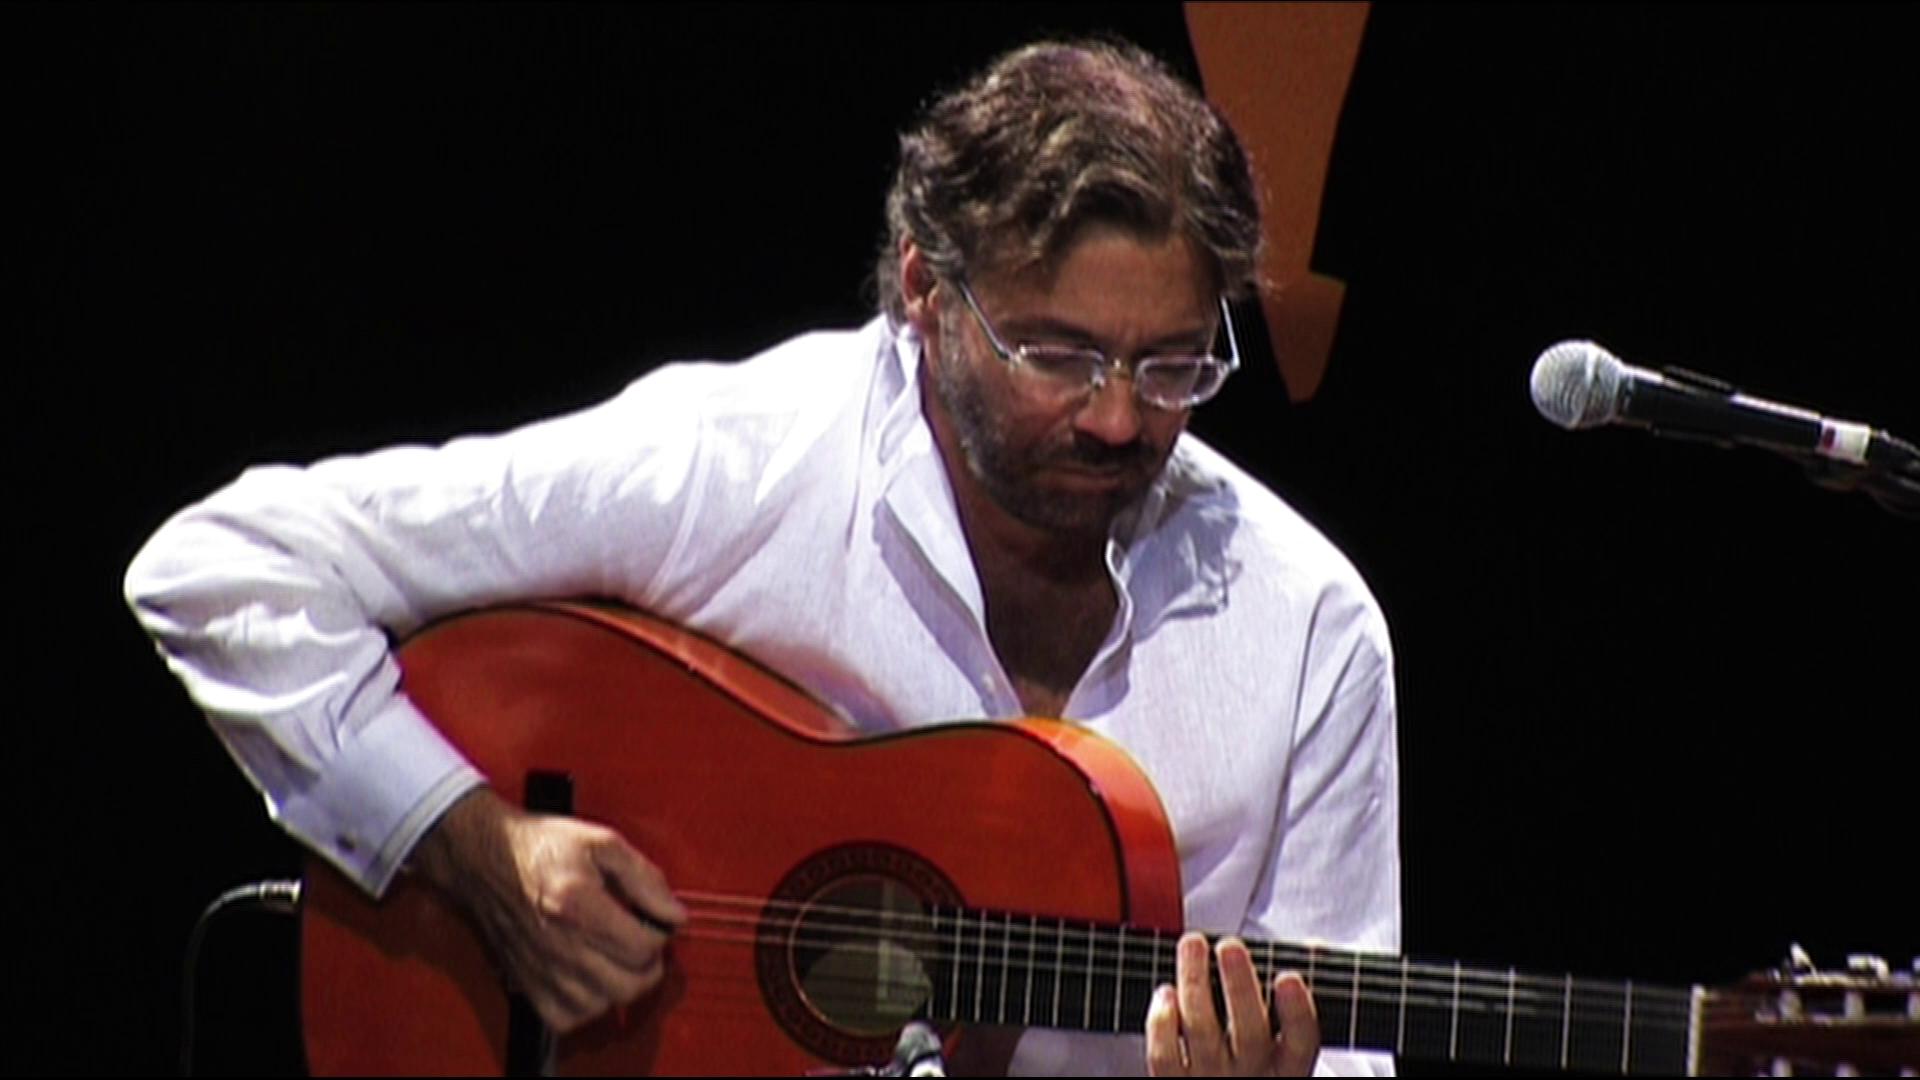 2009 Al Di Meola - Morocco Fantasia - World Sinfonia Live (2012) [Blu-ray] 0